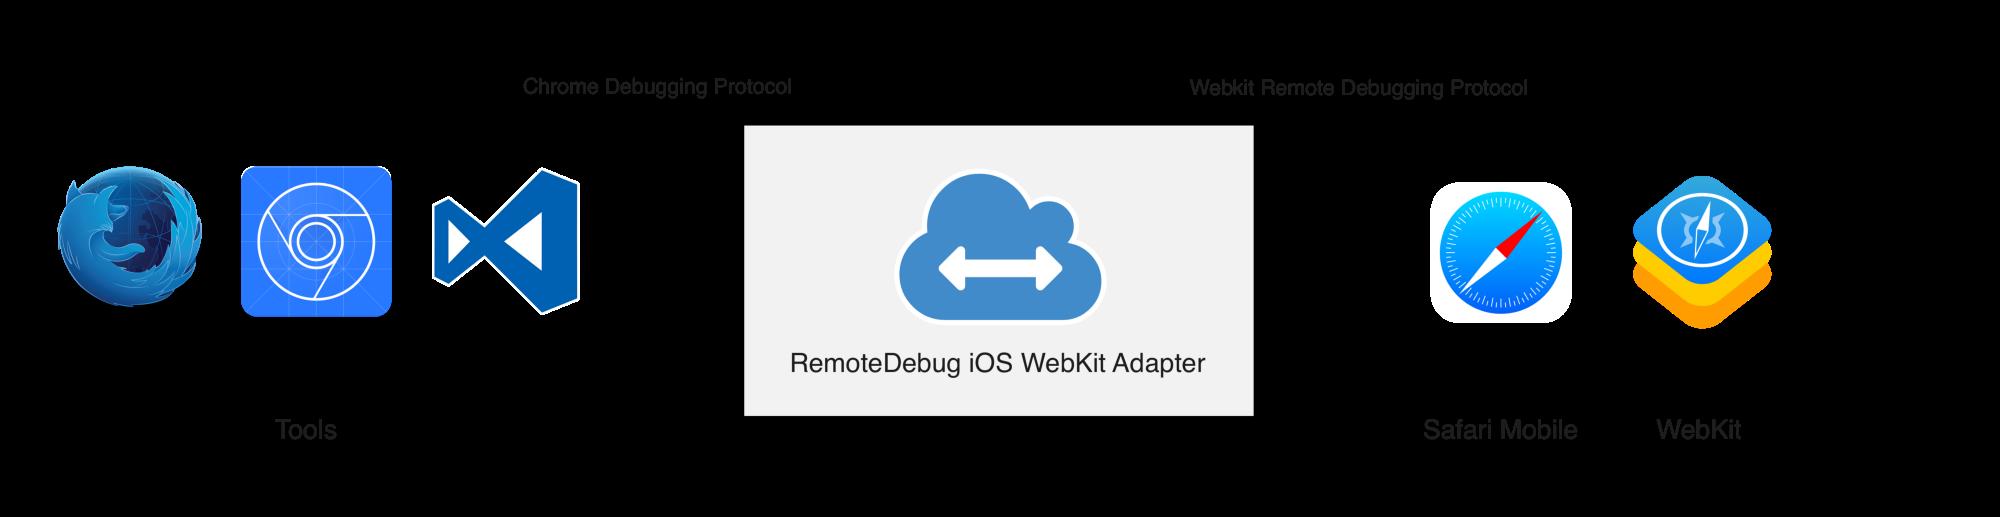 remotedebug-ios-webkit-adapter by RemoteDebug